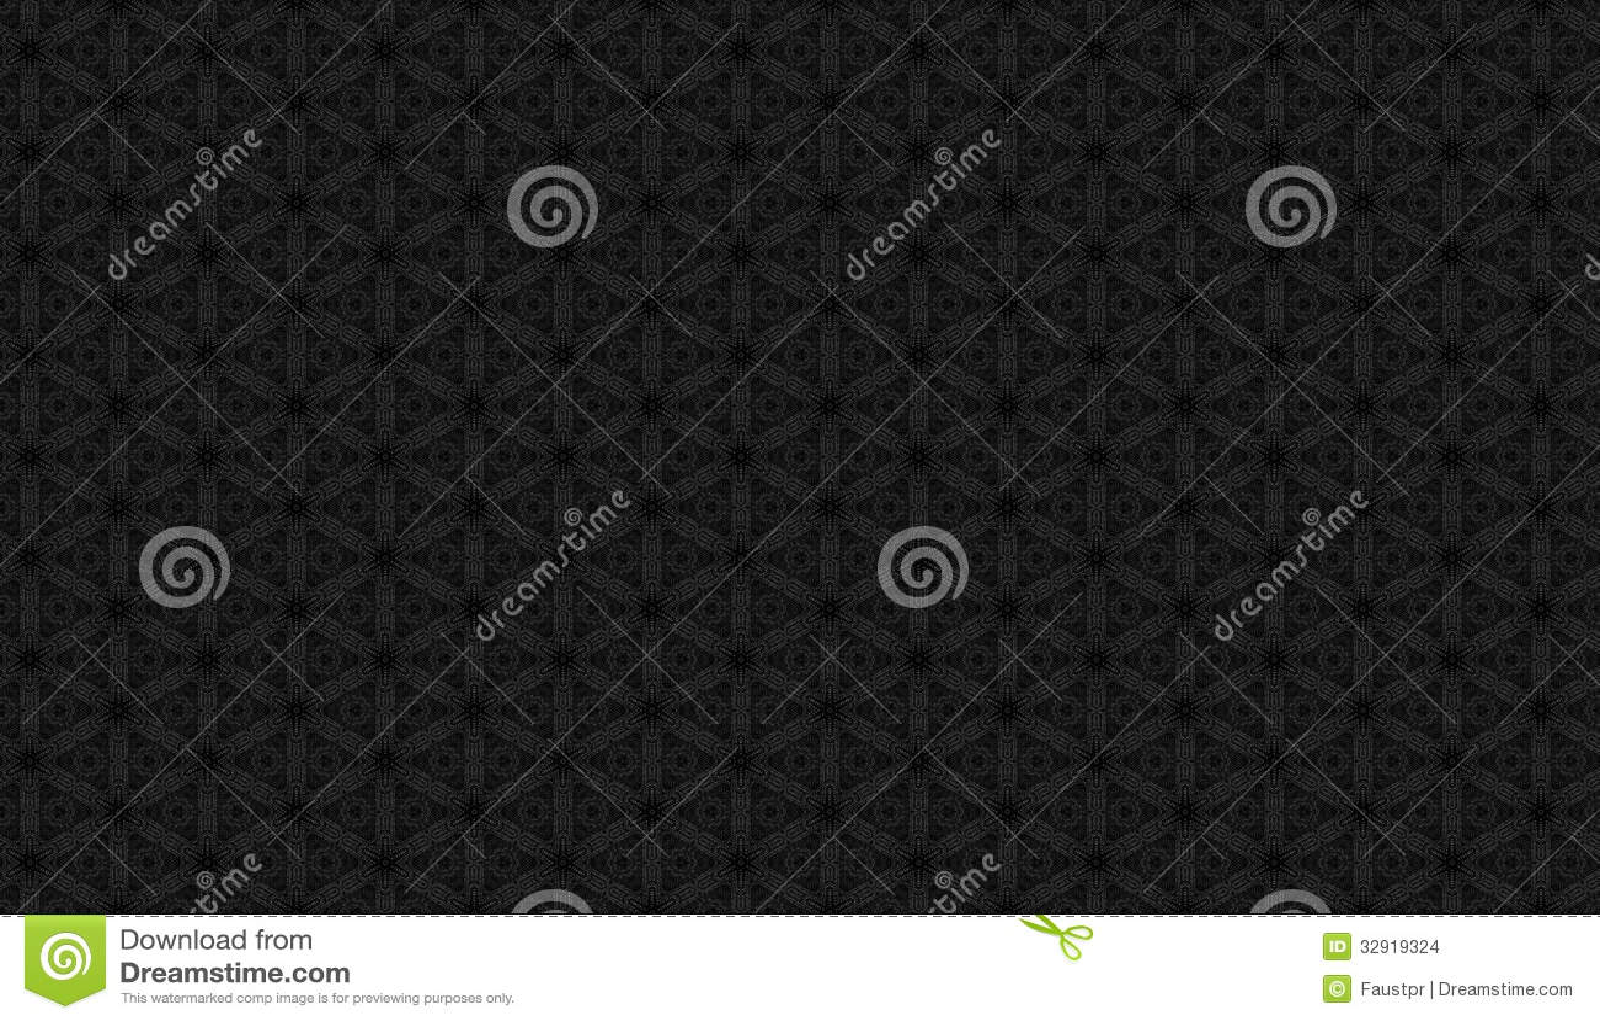 lace background tile - photo #28